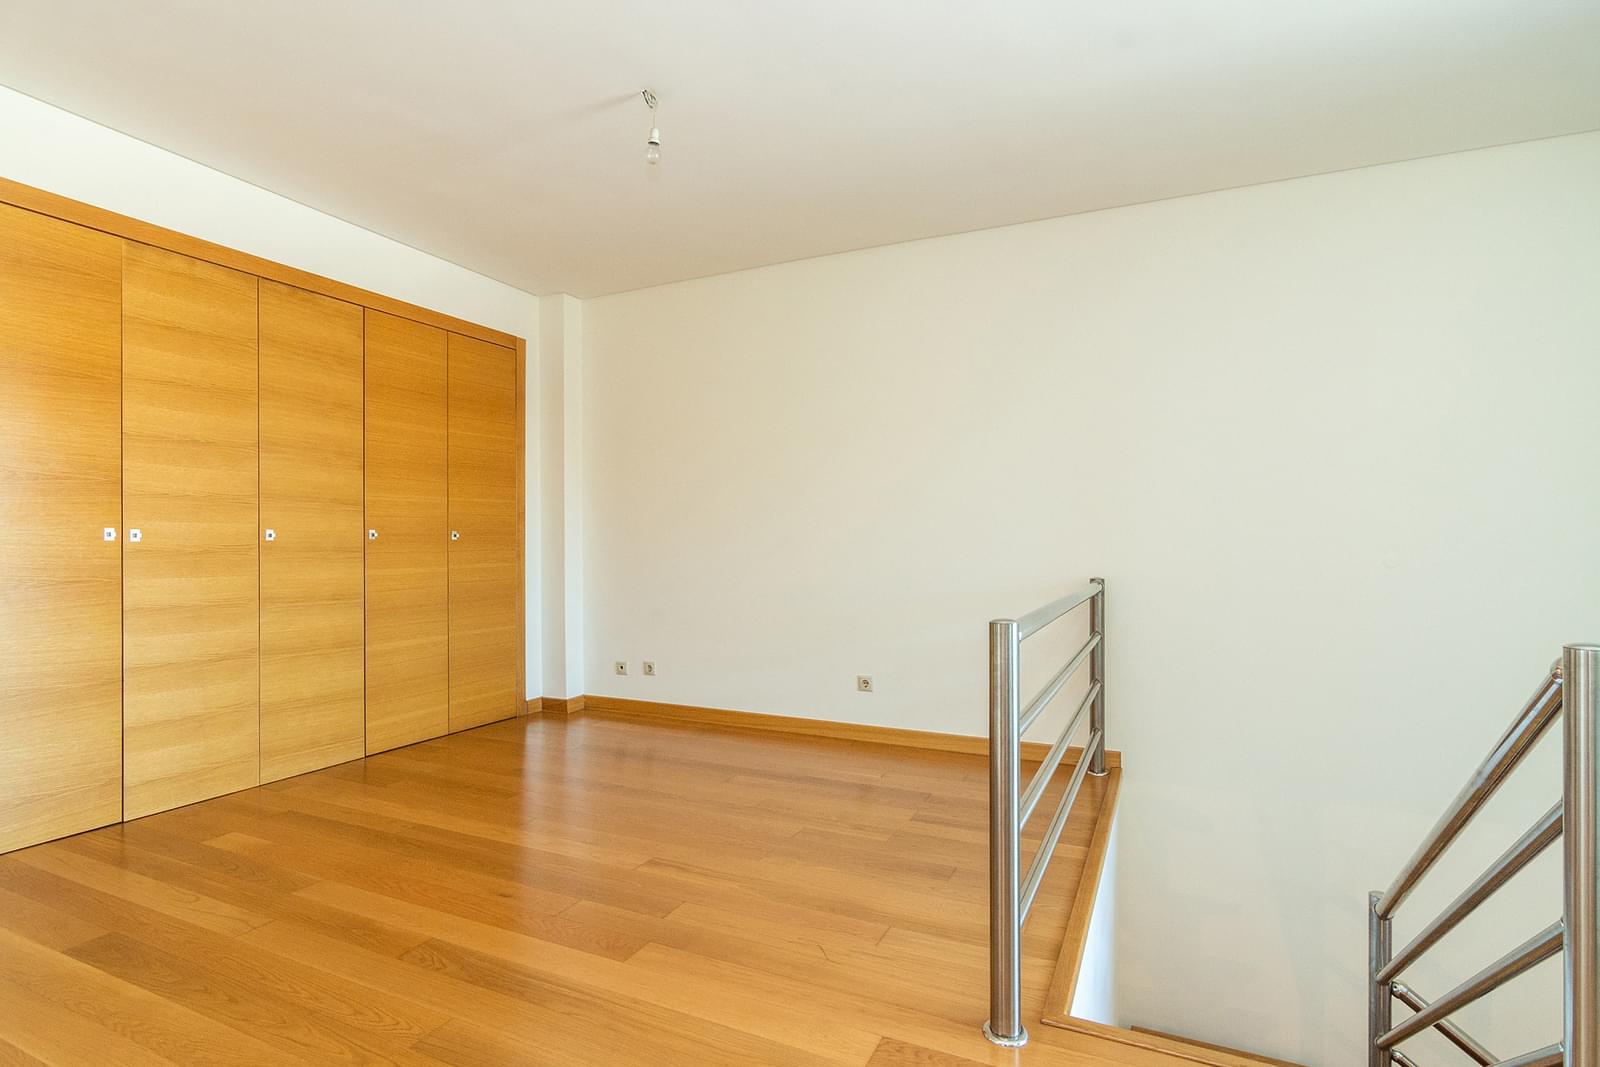 pf14588-apartamento-t5-lisboa-891b4b8e-dc9a-4069-9fb2-9f83026da3bc